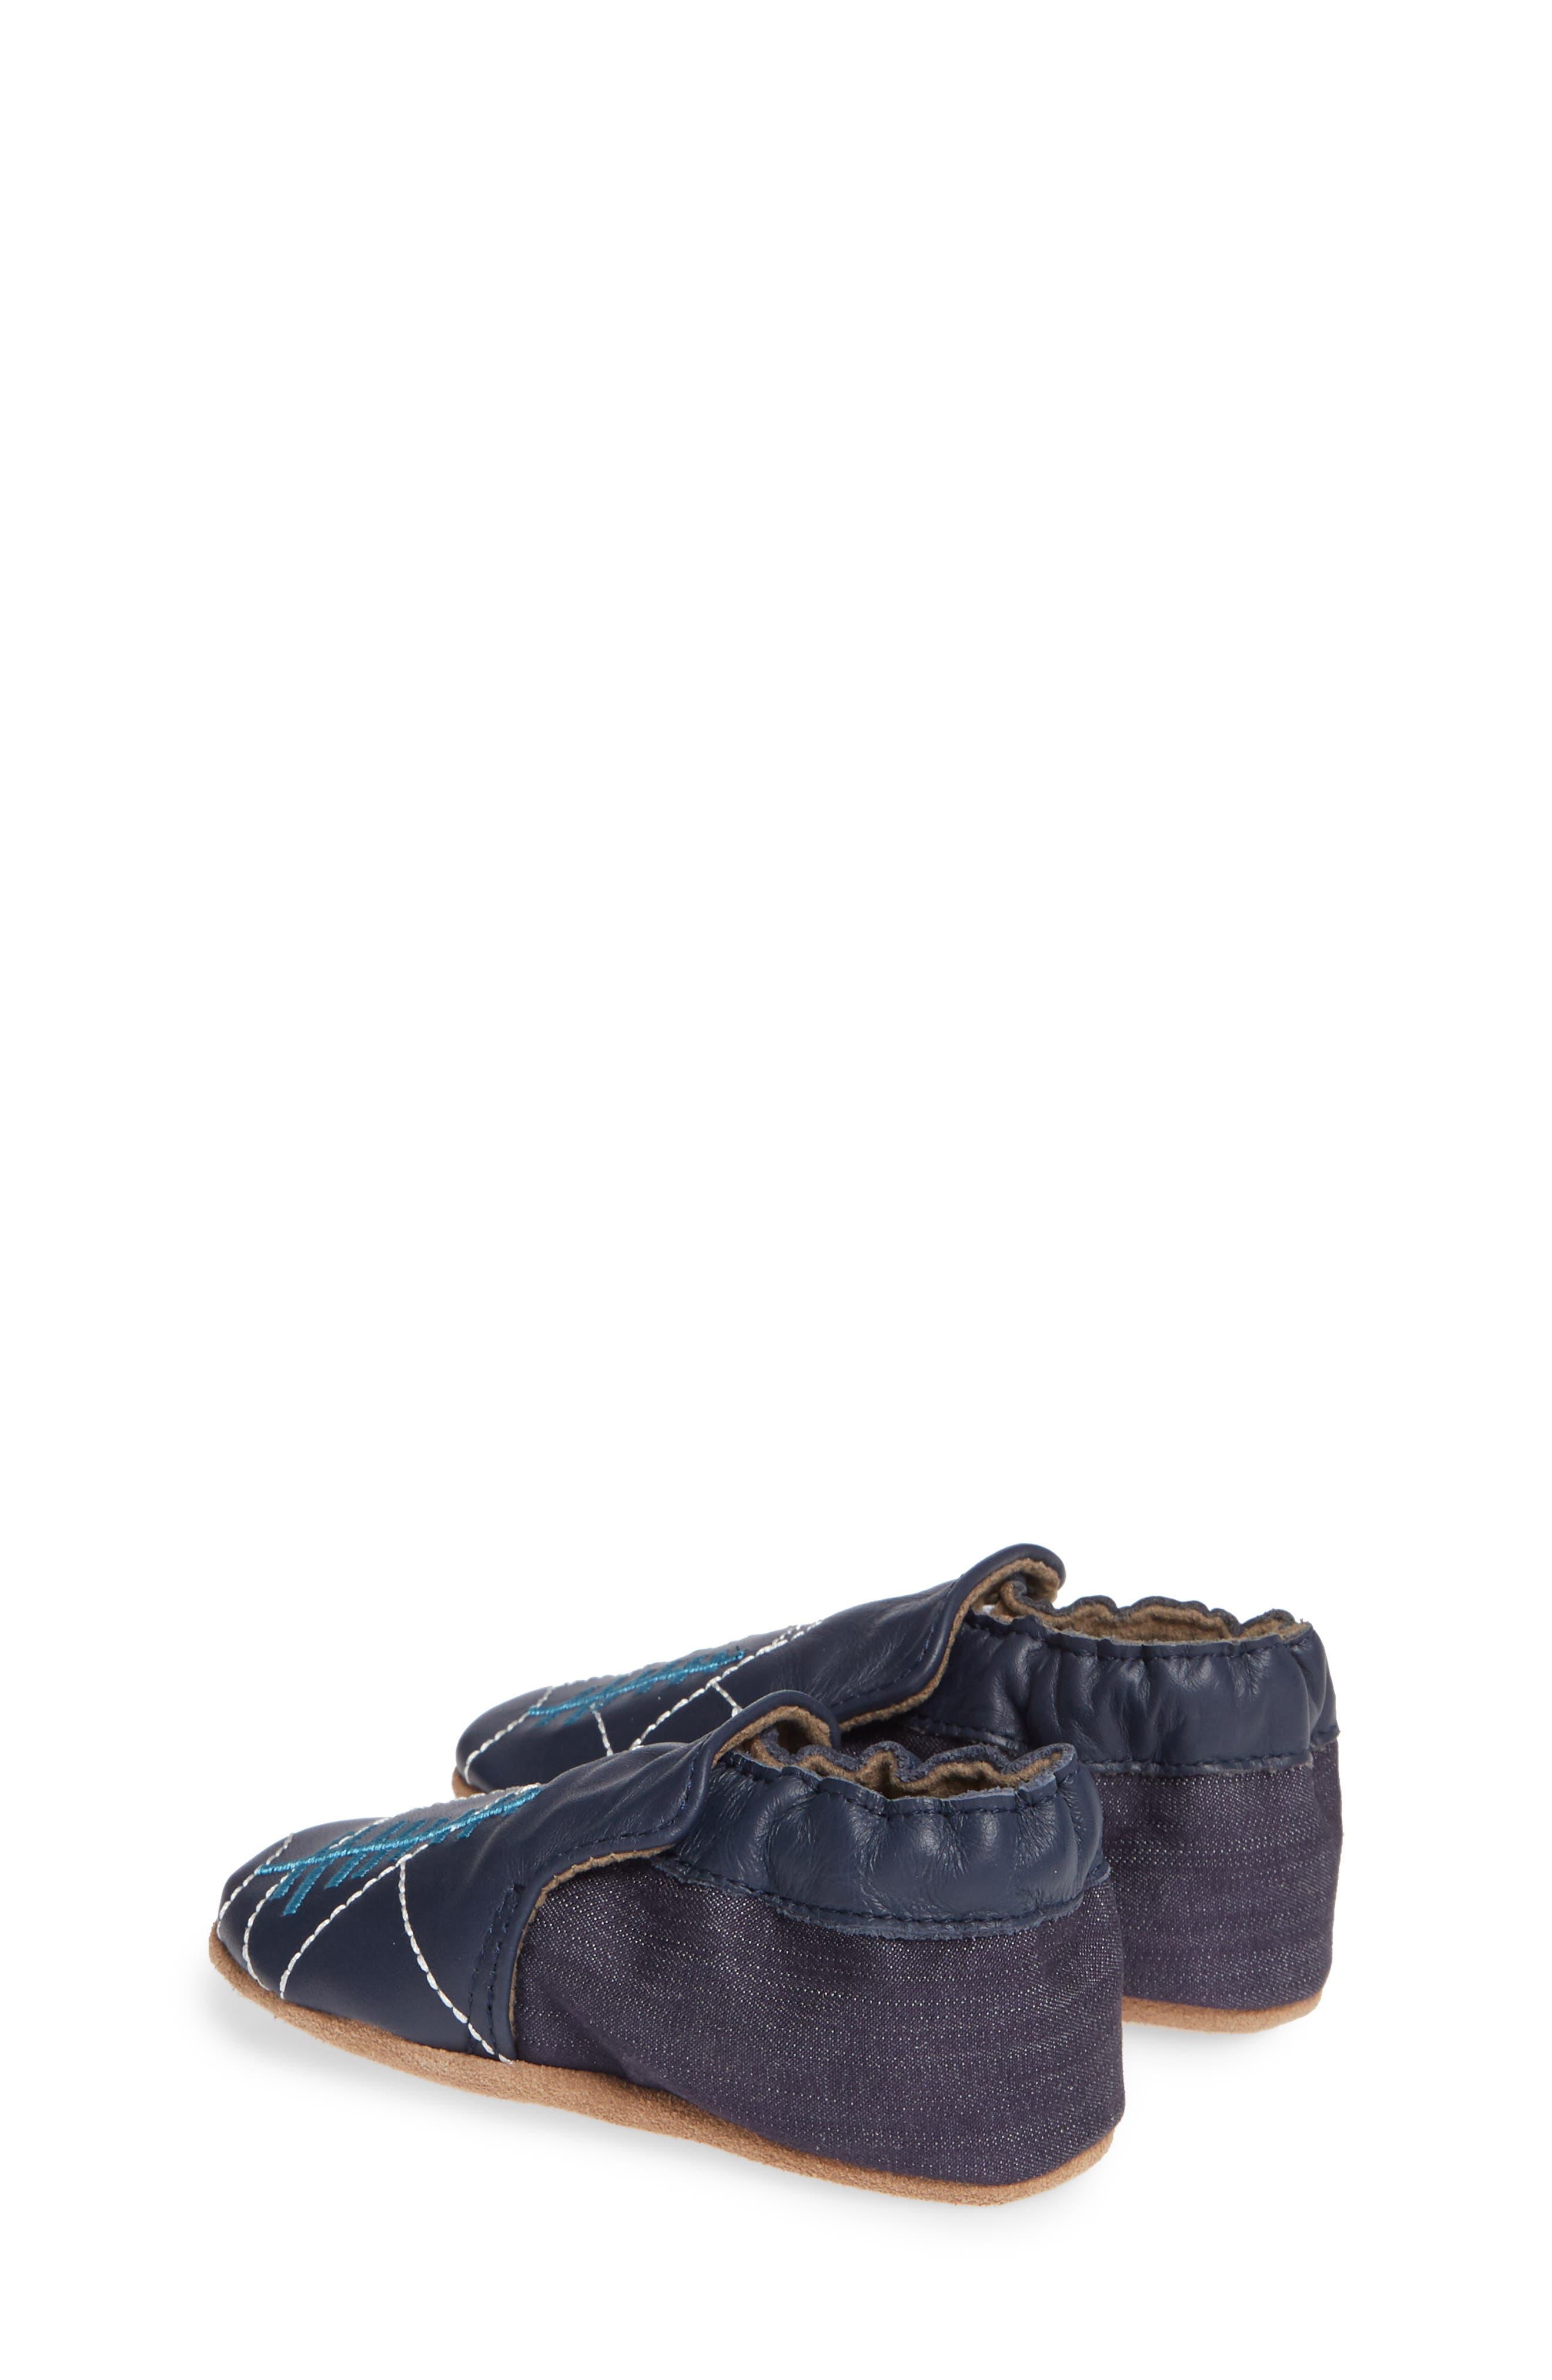 ROBEEZ<SUP>®</SUP>, Mountain Explorer Moccasin Crib Shoe, Alternate thumbnail 3, color, NAVY